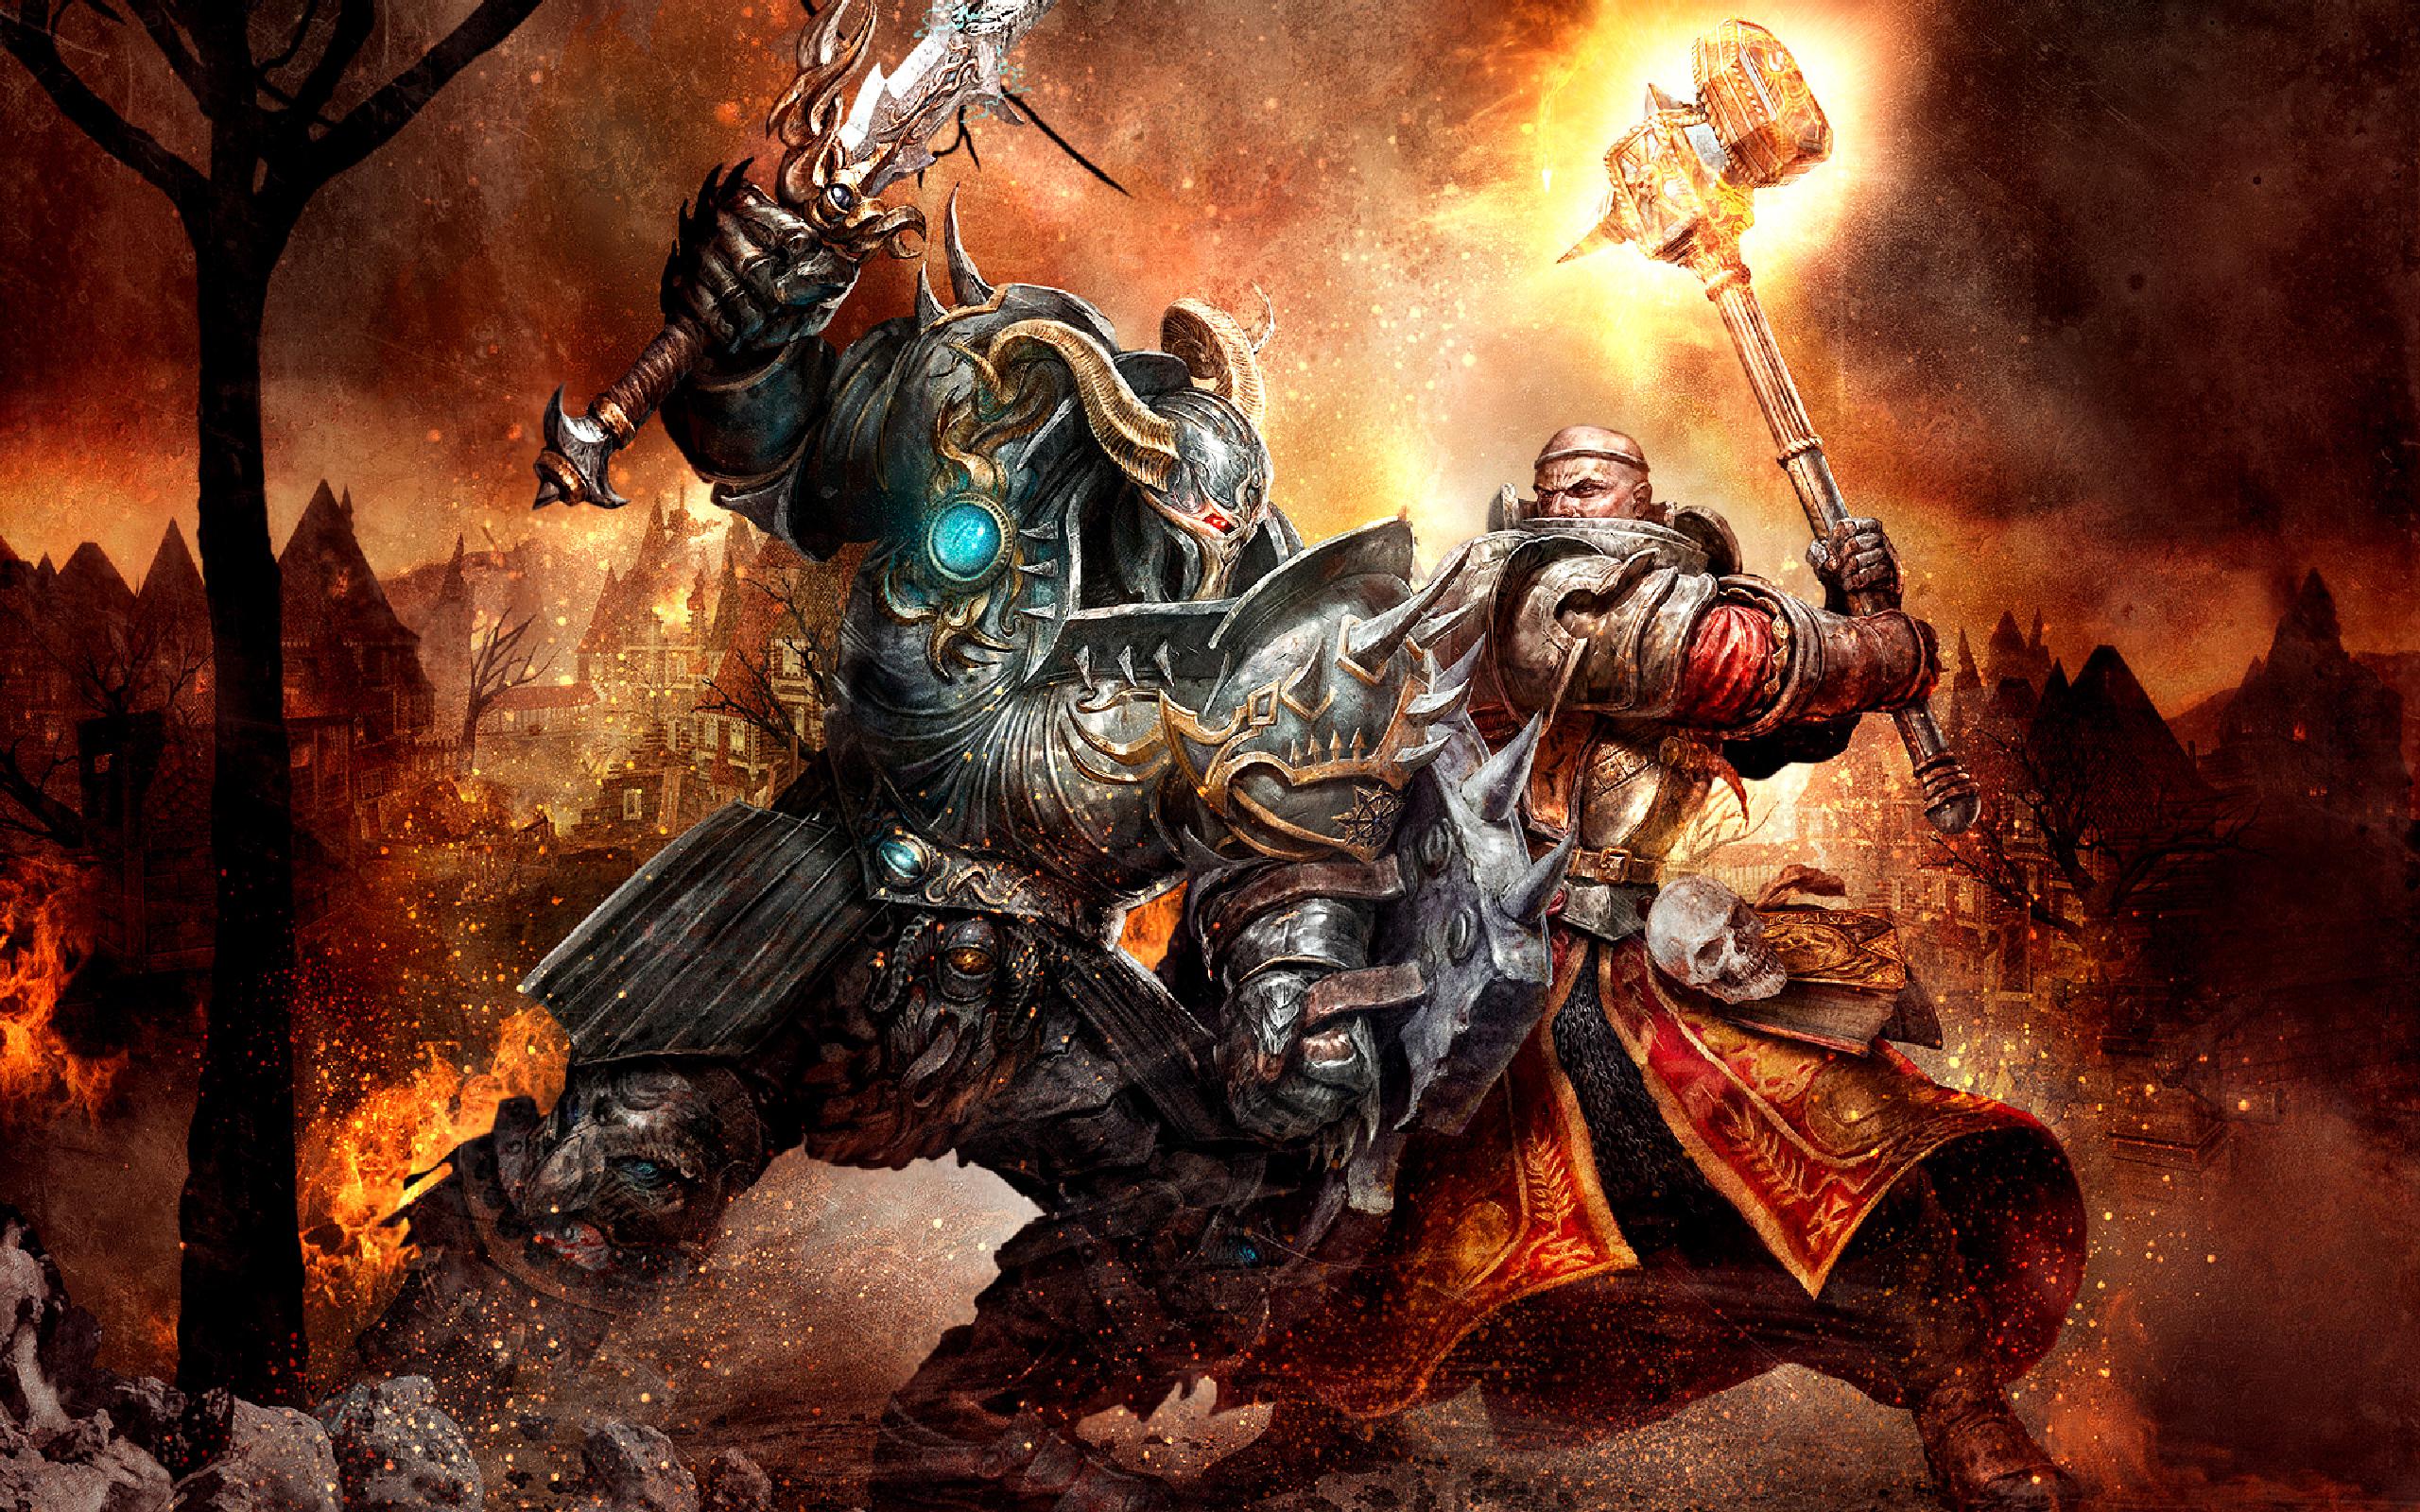 Hd wallpaper games - Hd Wallpaper Background Id 144312 2560x1600 Video Game Warhammer